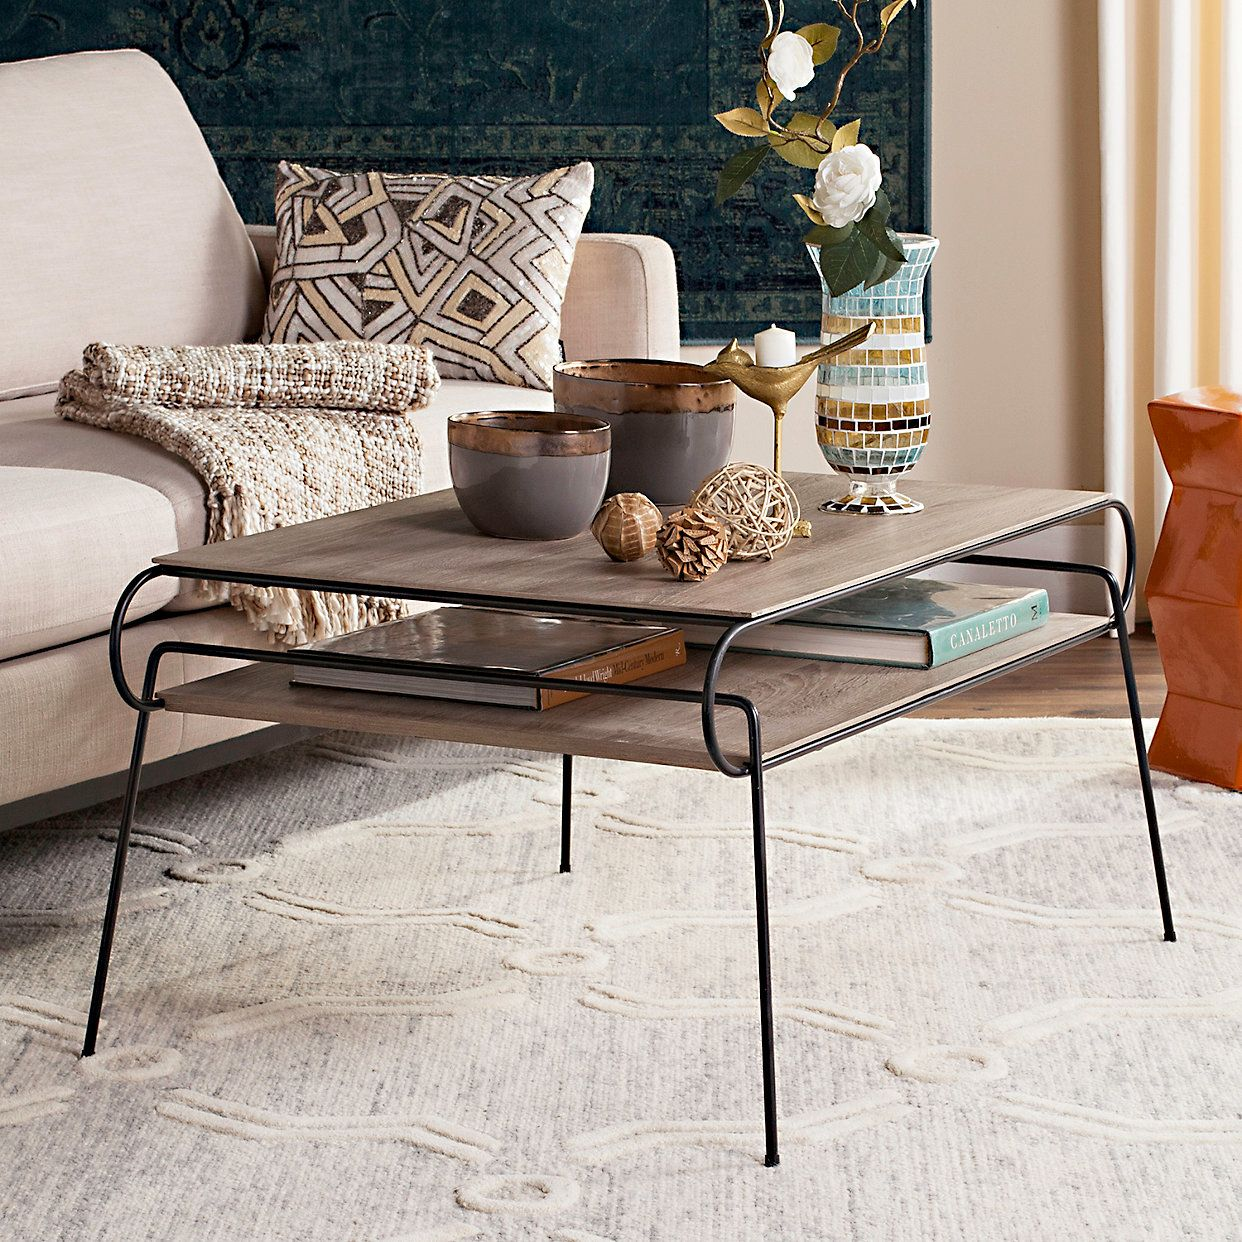 Safavieh Mid Century Modern 2 Tier Coffee Table Kohls In 2020 Coffee Table Contemporary Coffee Table Home Decor [ 1242 x 1242 Pixel ]